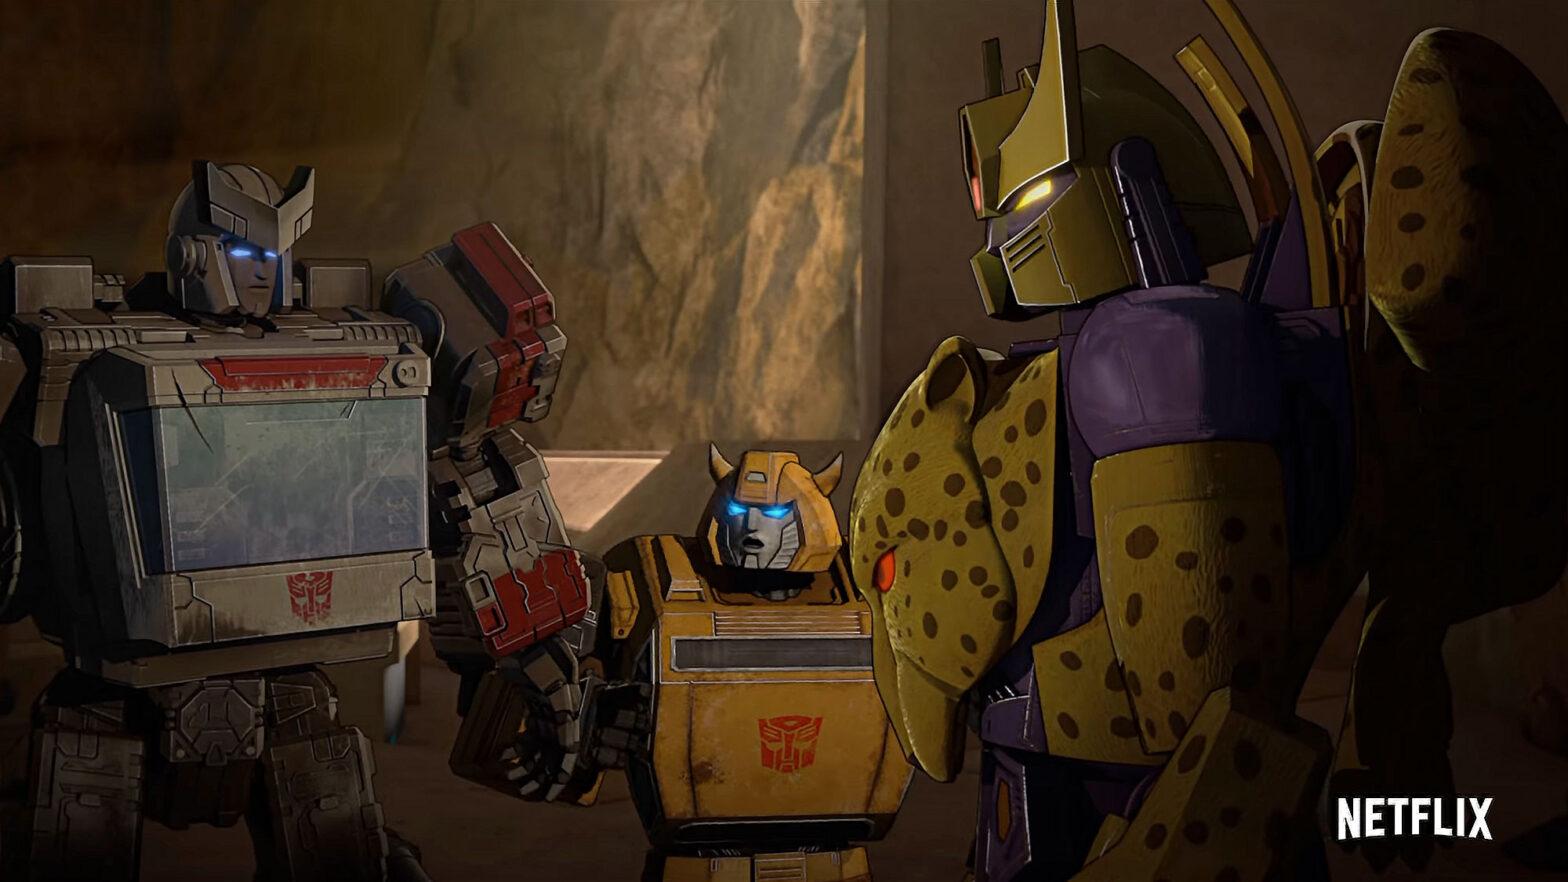 Netflix Transformers War for Cybertron Kingdom Trailer